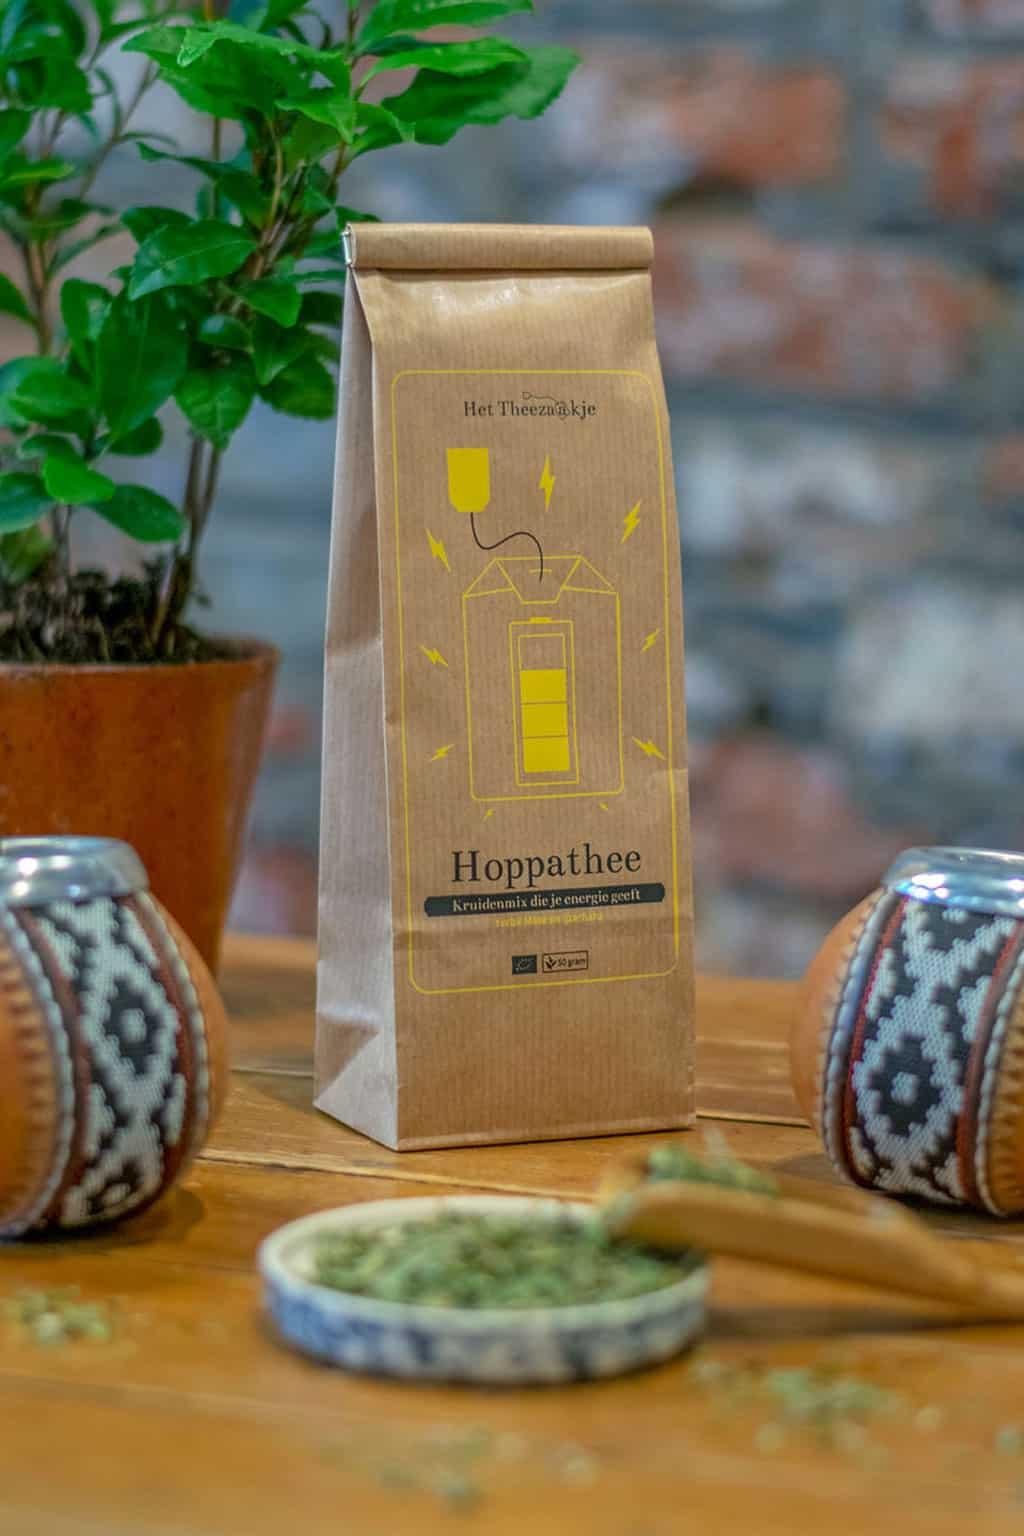 Hoppathee – Kruidenmix die je energie geeft